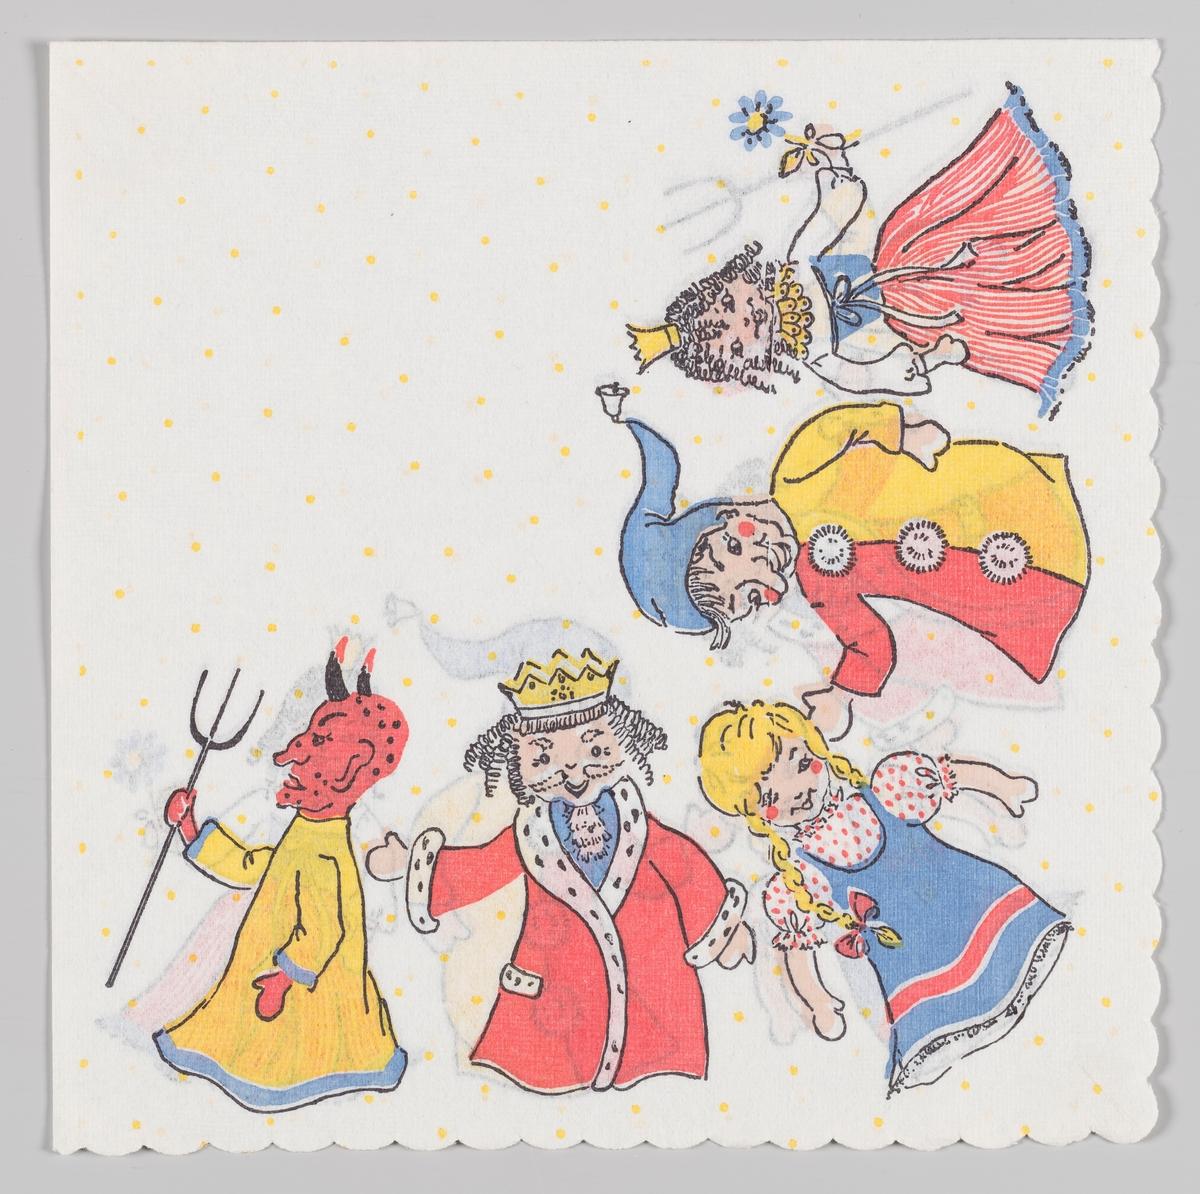 En jævel, en konge, en jente, en hoffnar og en prinsesse på rekke.